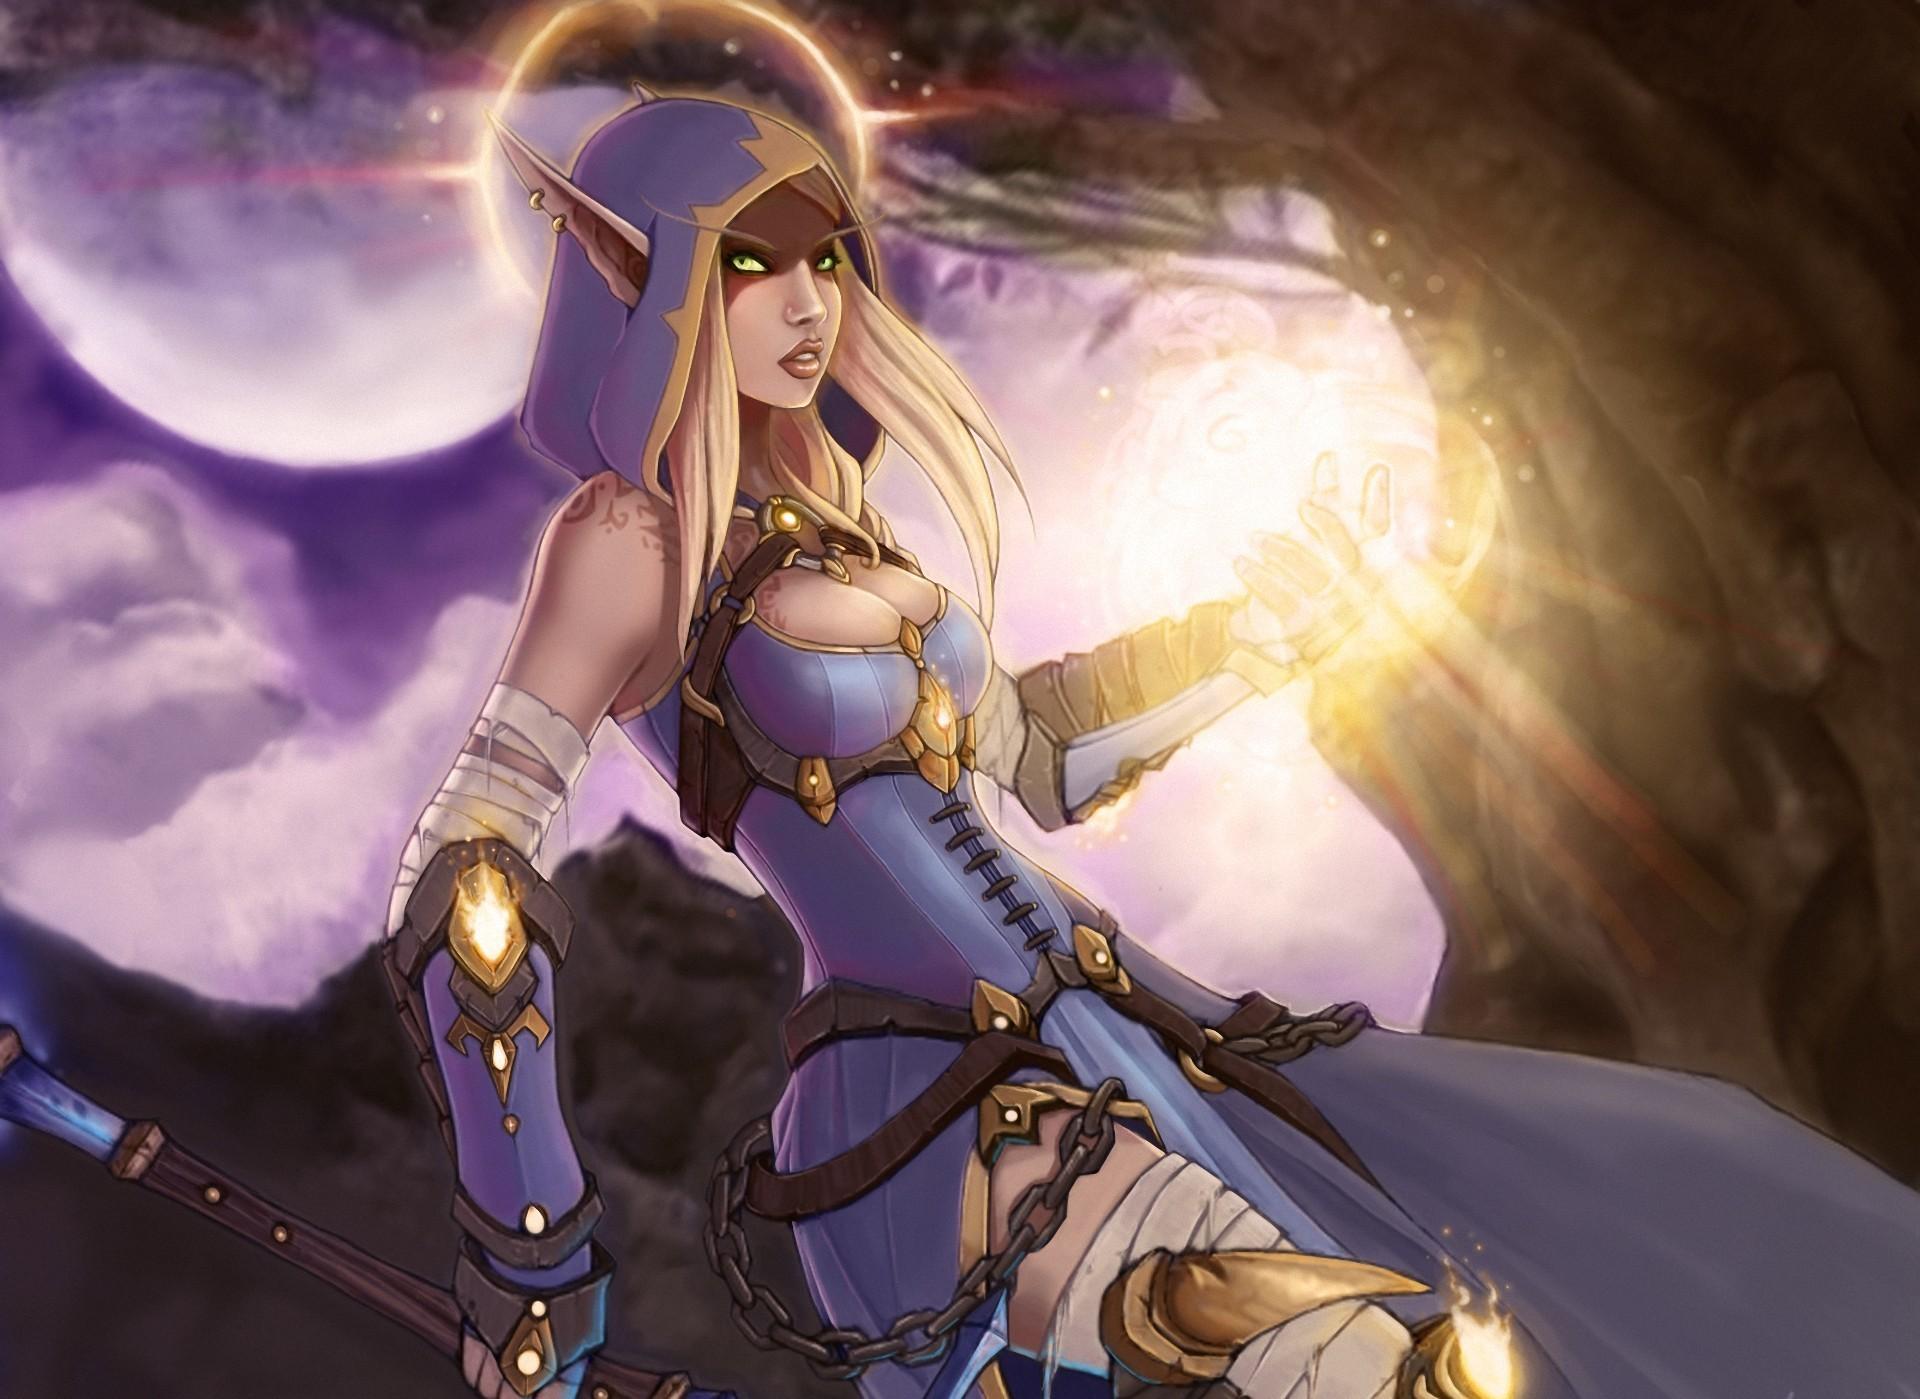 Elf priest quests world of warcraft porncraft tube